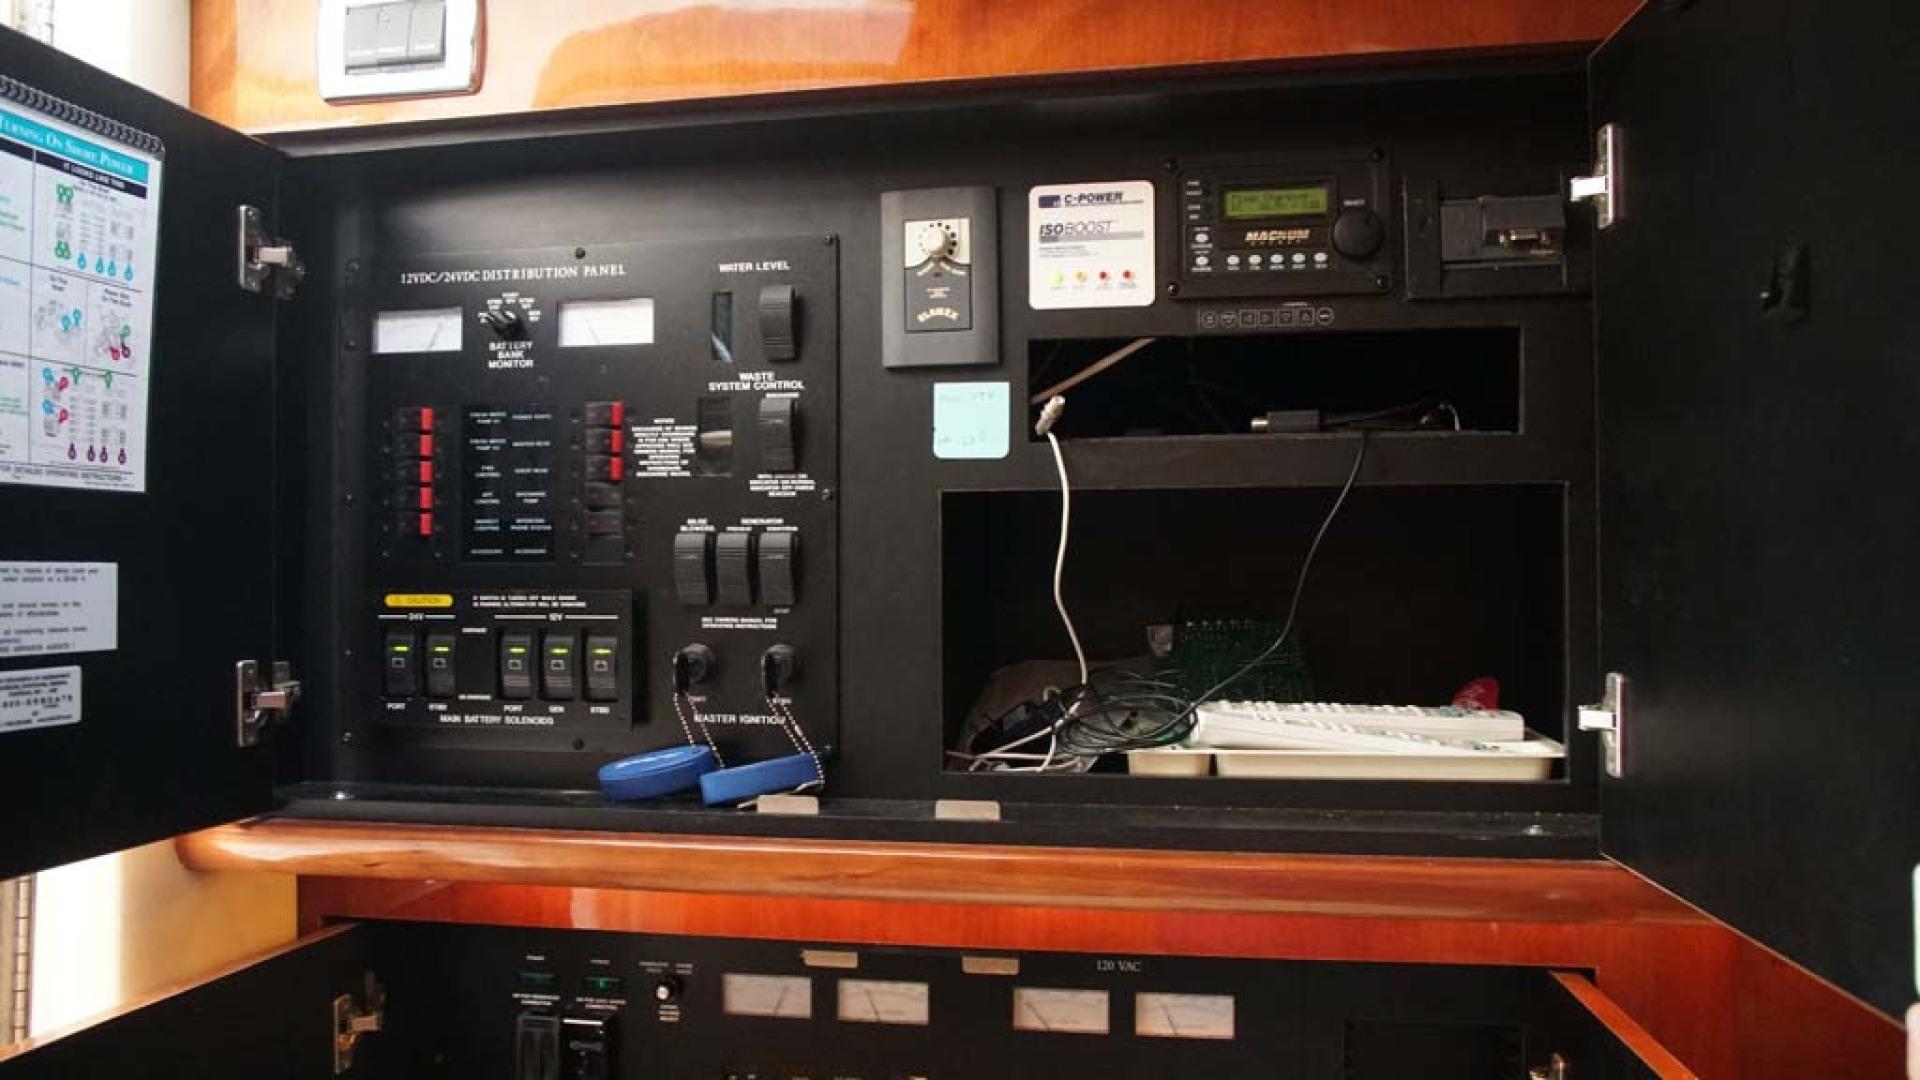 Sea Ray-510 Sundancer 2002-Therapy Orange Beach-Alabama-United States-Electrical Panel-1074376 | Thumbnail